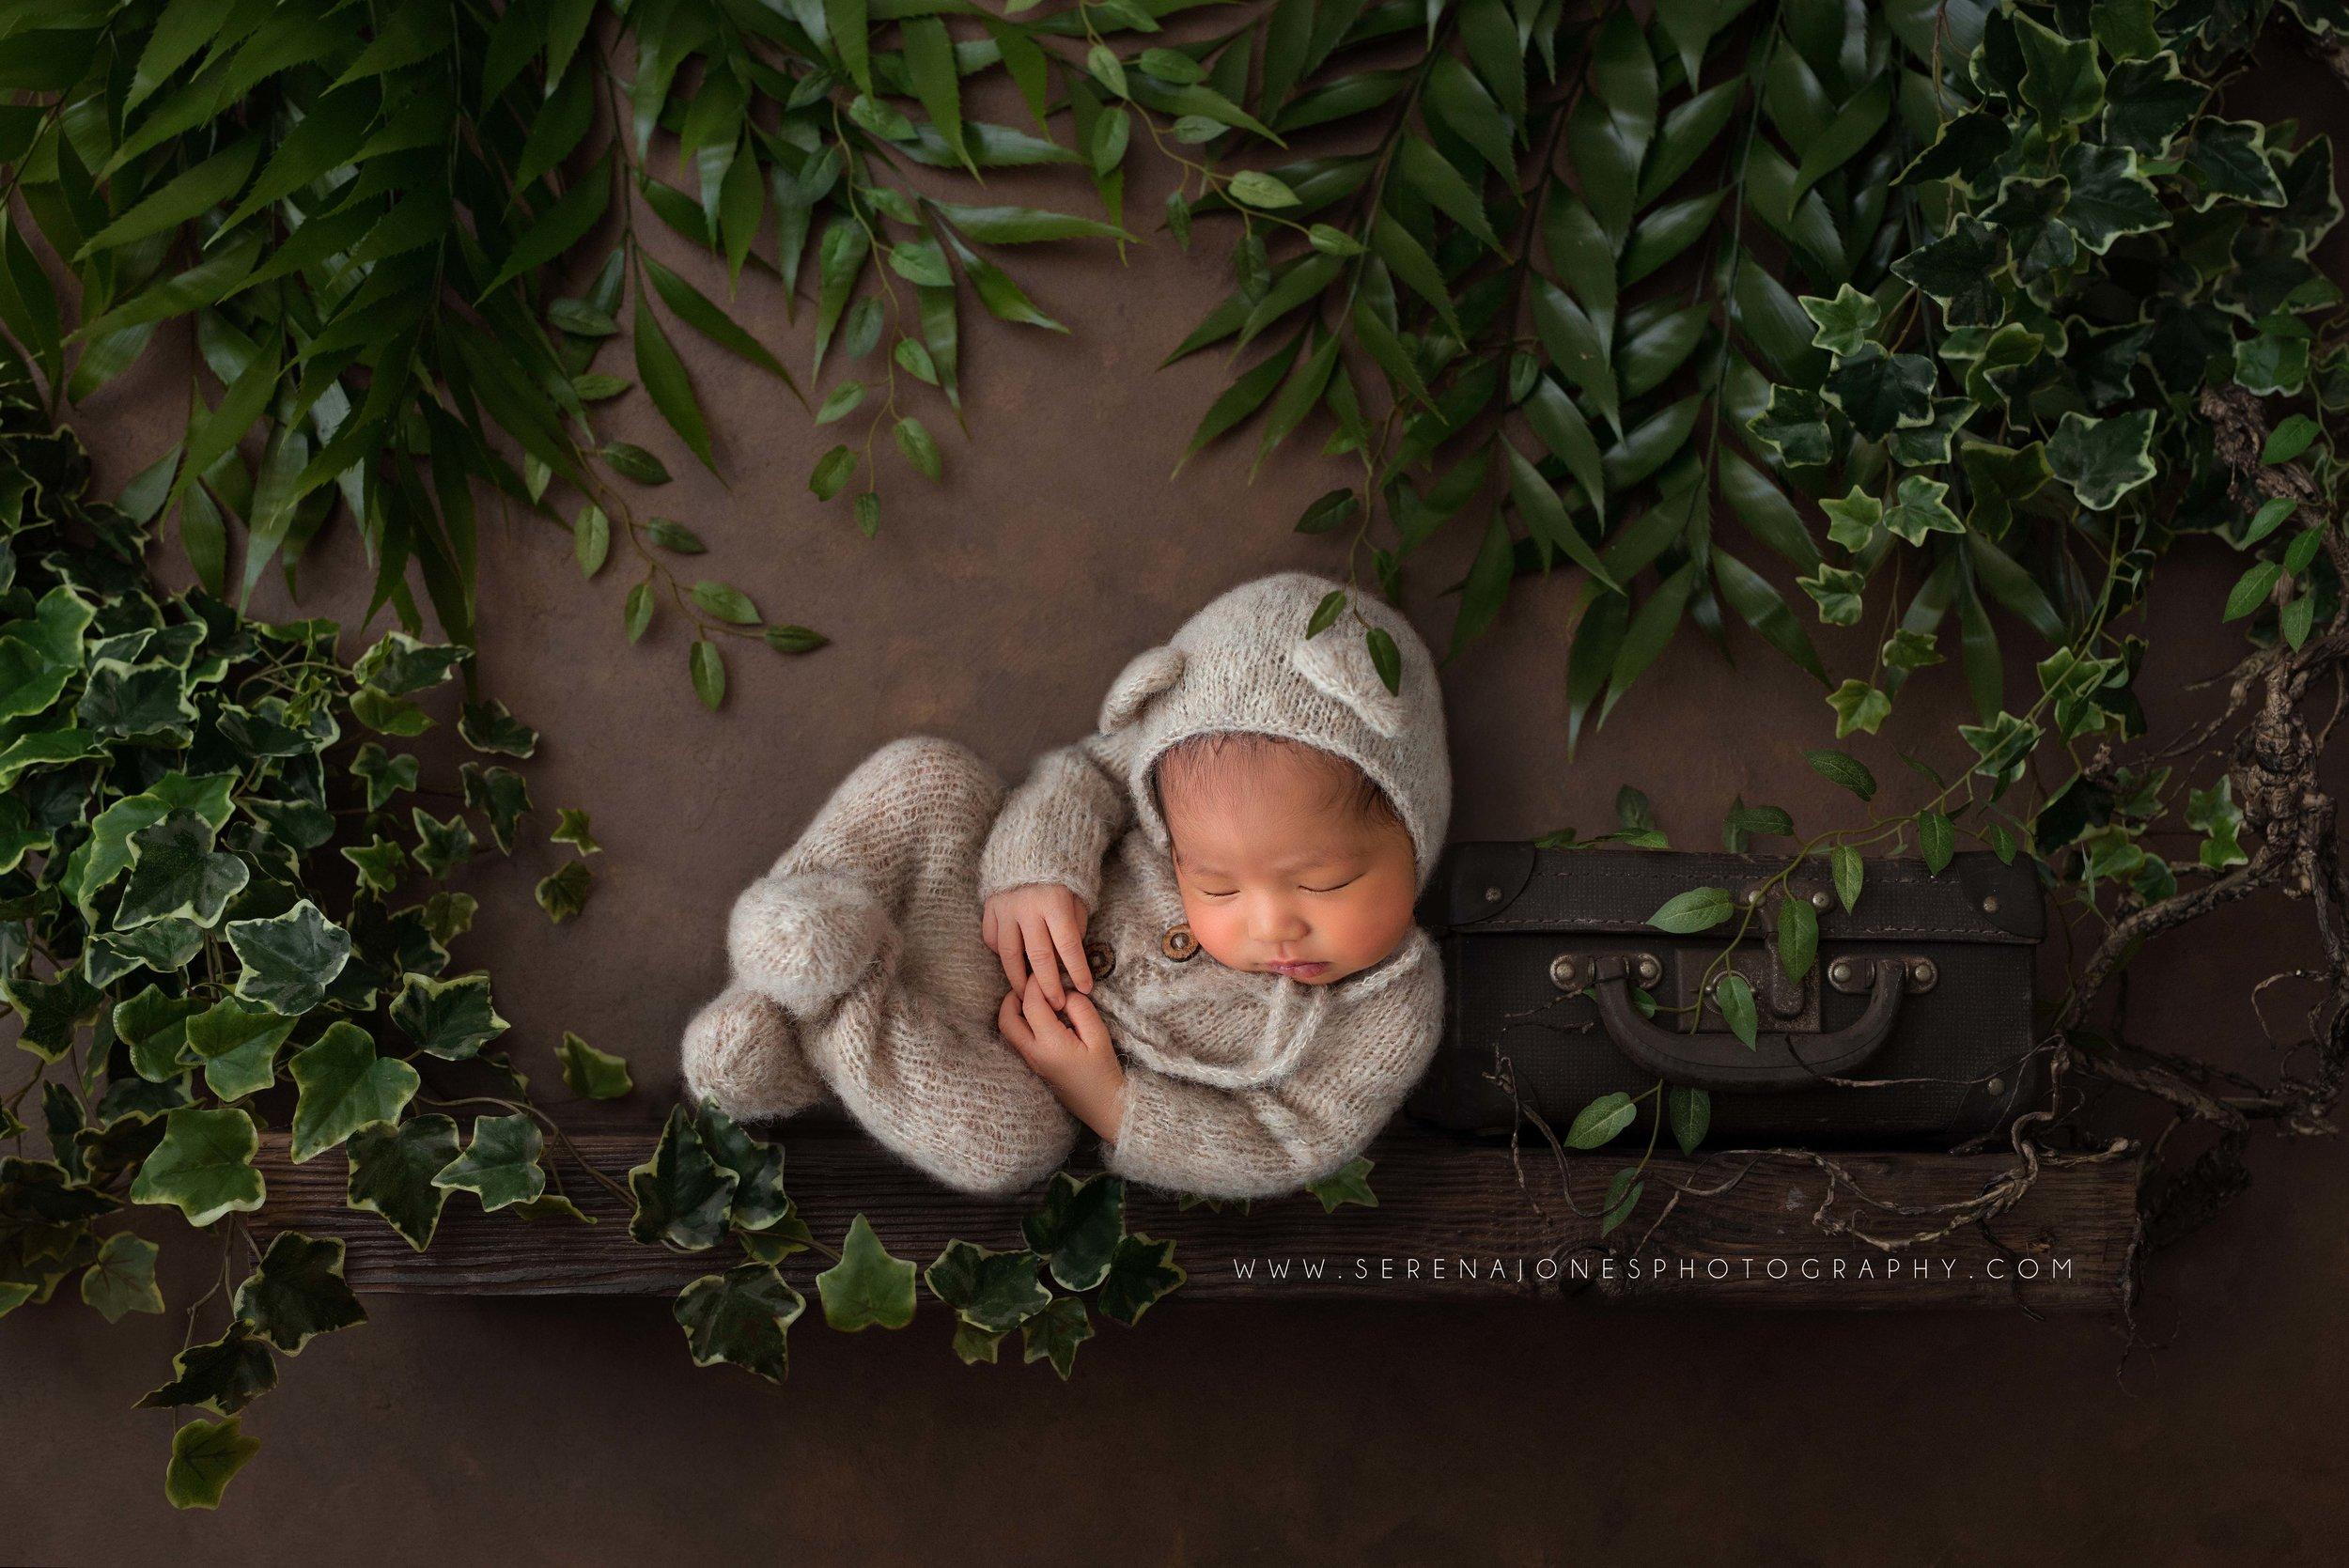 Serena Jones Photography - Tobias Akira Mateo - 43 FB.jpg